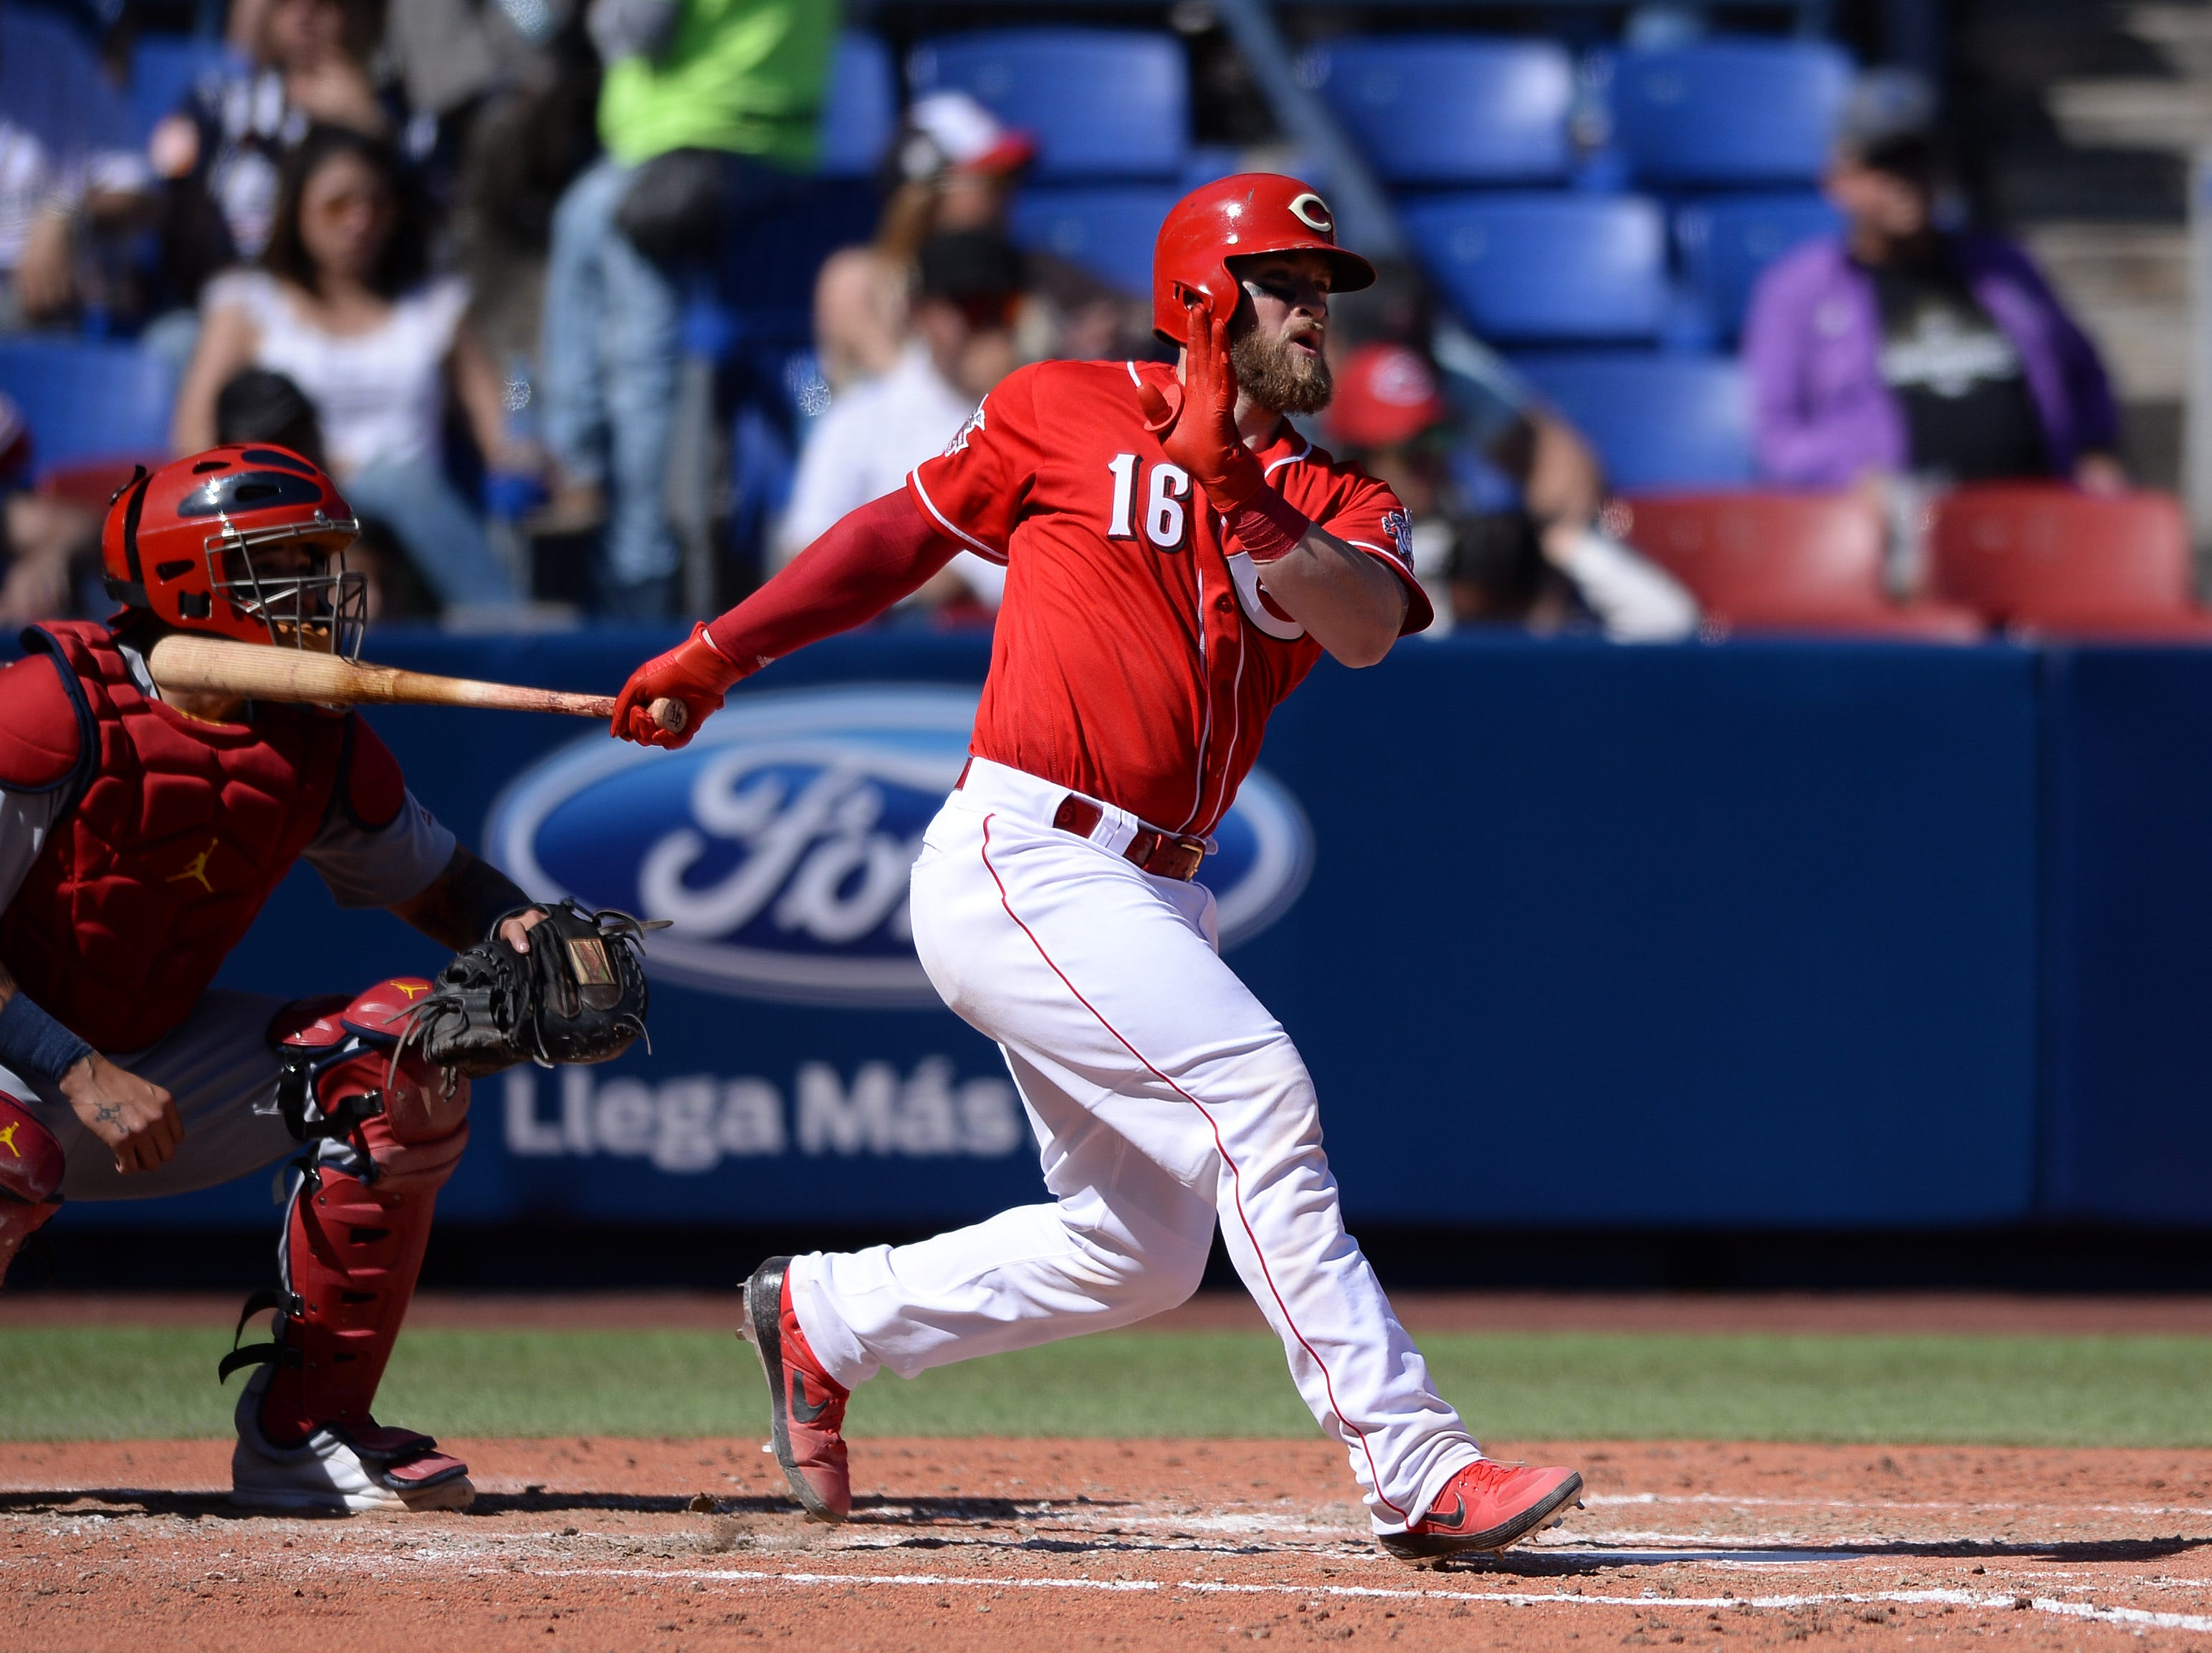 Cincinnati Reds catcher Tucker Barnhart (16) hits a single during the fifth inning against the St. Louis Cardinals at Estadio de Beisbol Monterrey.